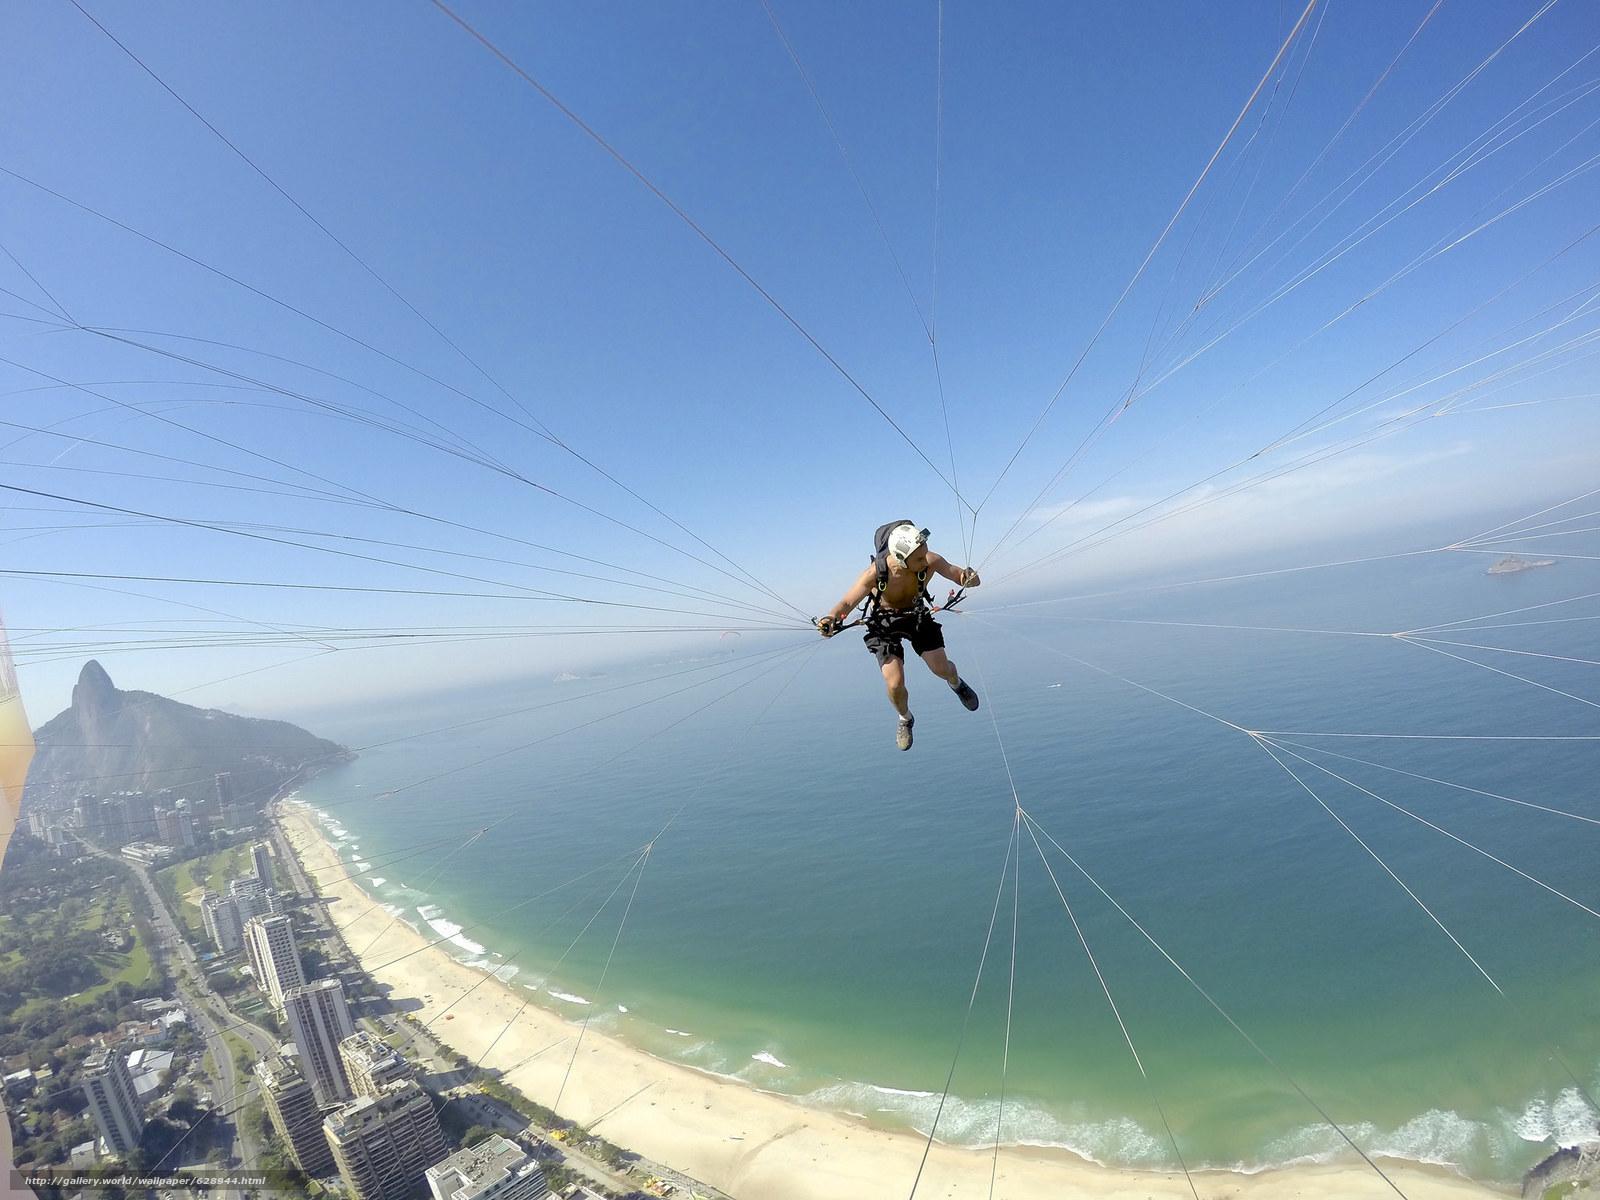 piloto, c?mera, paraglider, capacete, parapente, fio, praia, mar, ilha, HORIZON, c?u, Brasil, Rio de Janeiro, esportes radicais